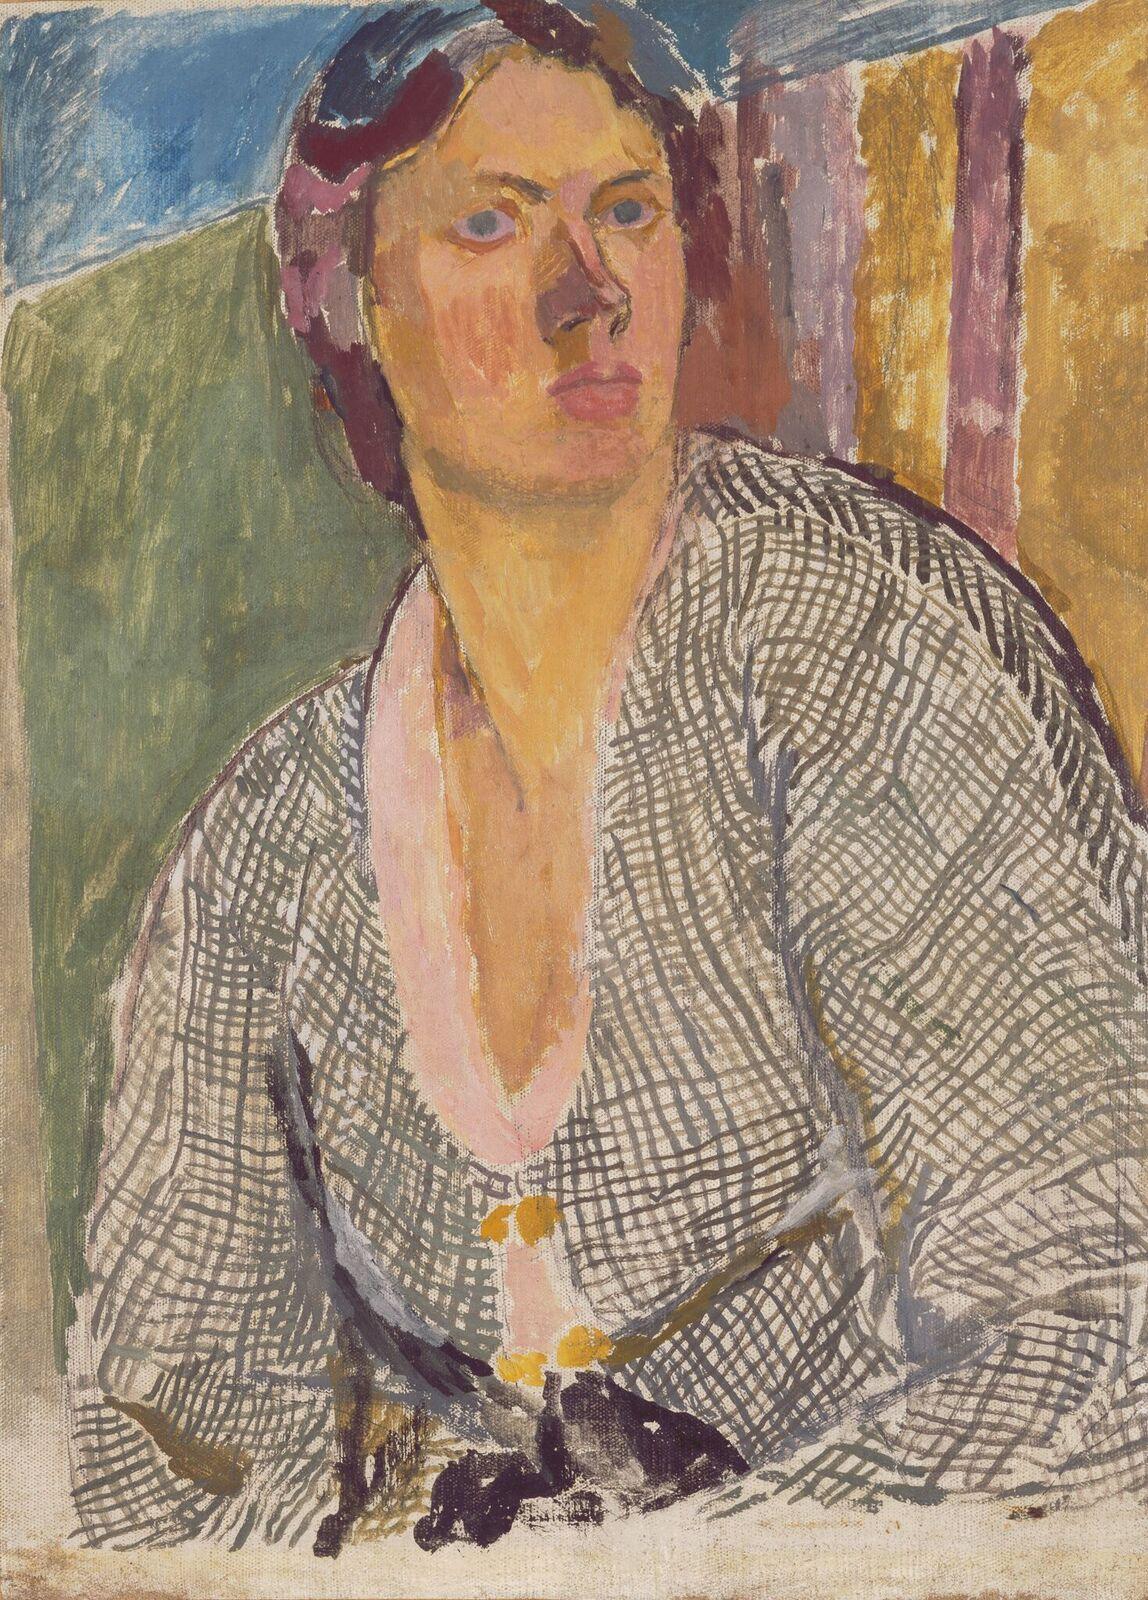 Vanessa Bell, VirginiaWoolf, c. 1912, oil on board, 40 x 34 cm,National Portrait Gallery, London, NPG 5933.©National Portrait Gallery, London